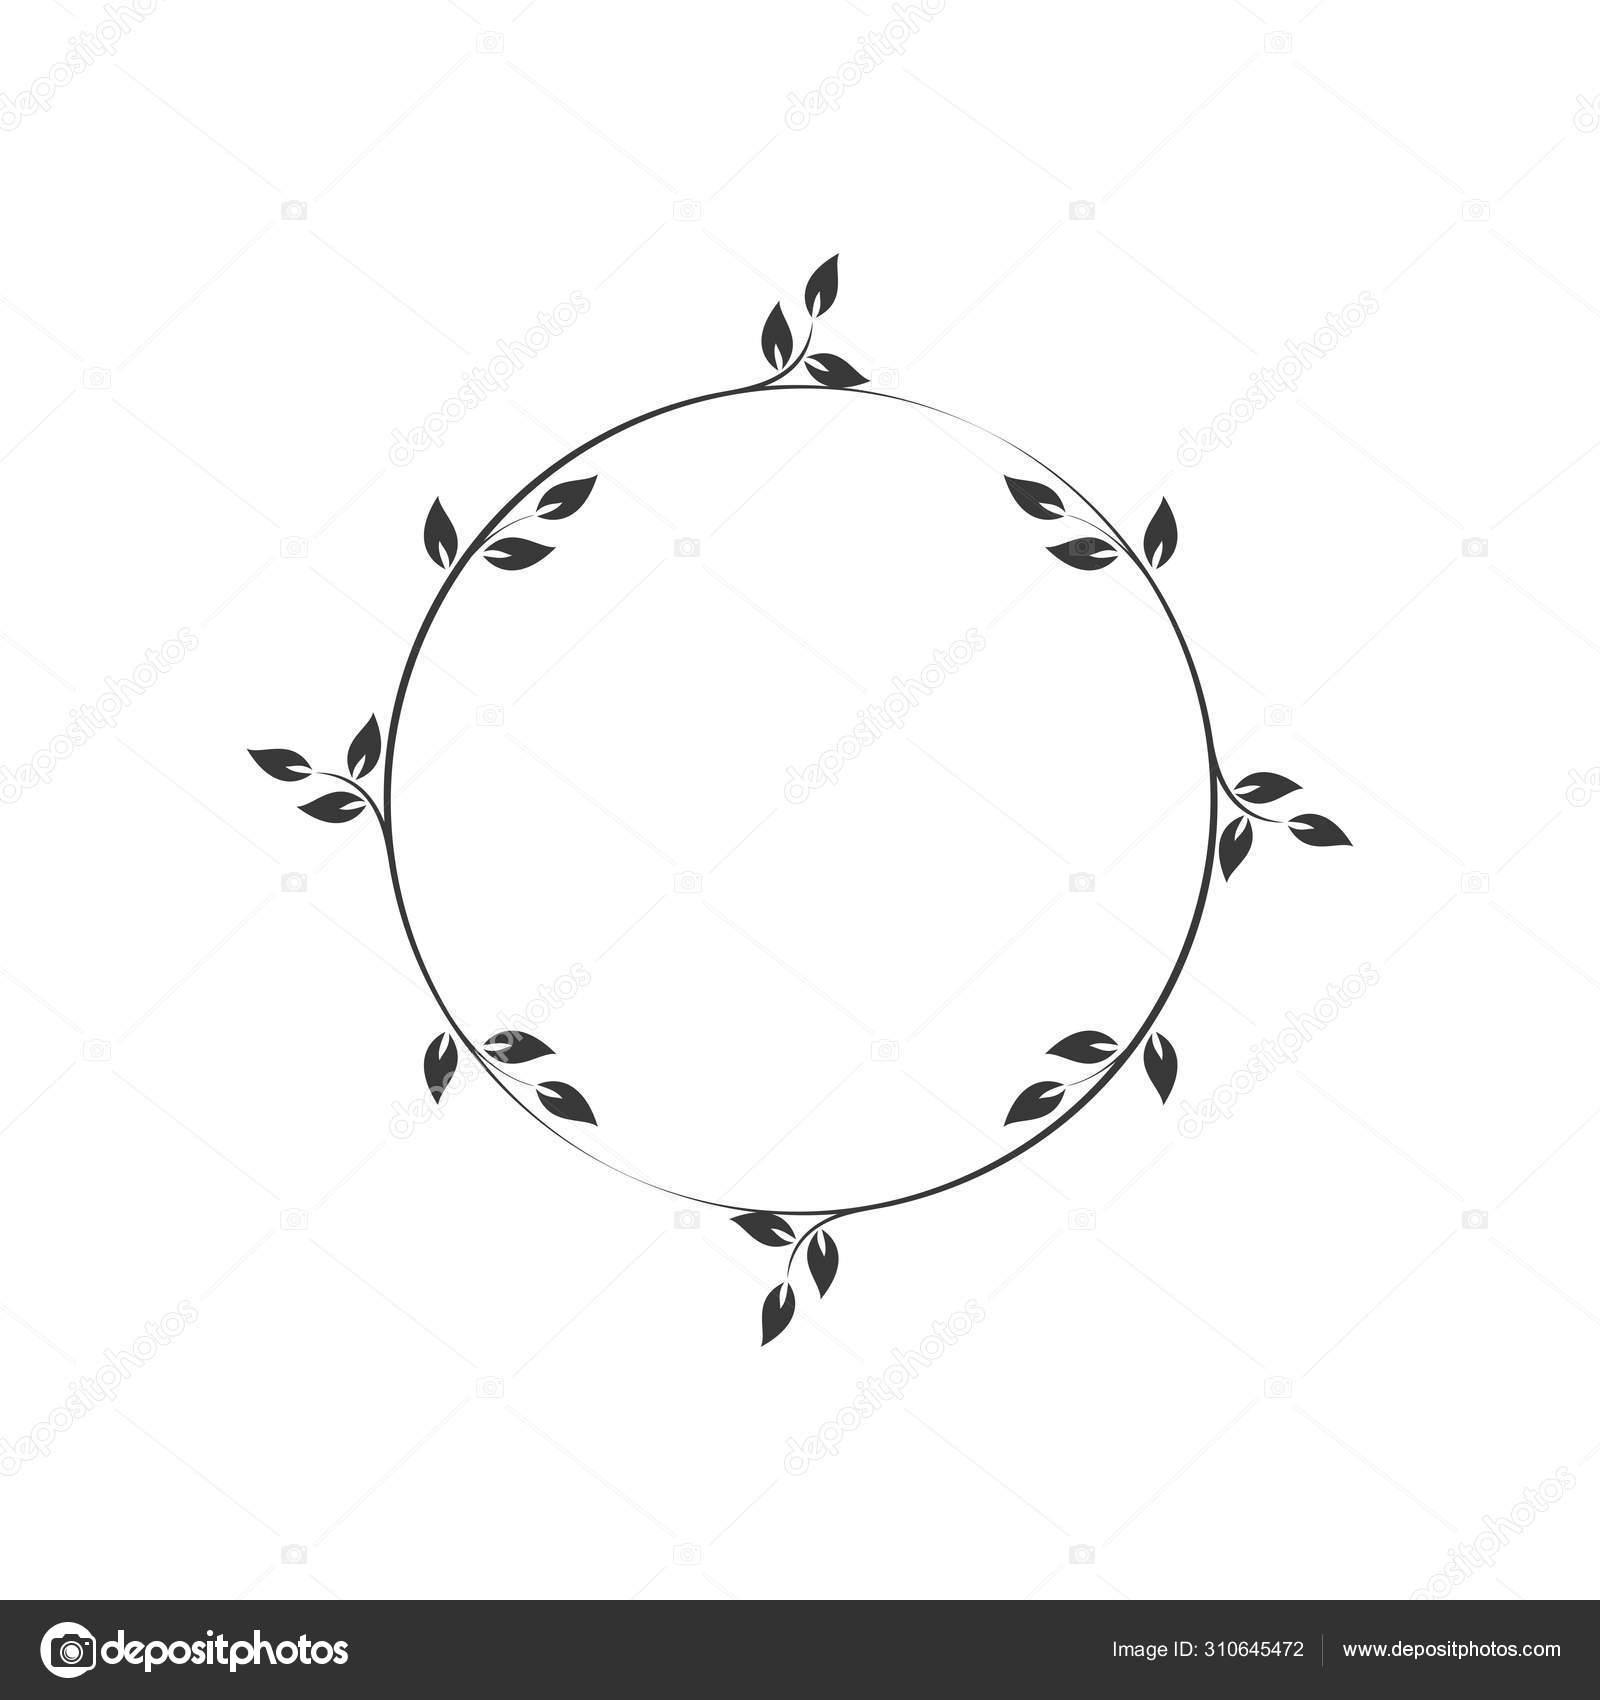 Vintage Floral Frames Black Decorative Circular Ivy Wreath Vector Illustration Stock Vector C Imaagio 310645472